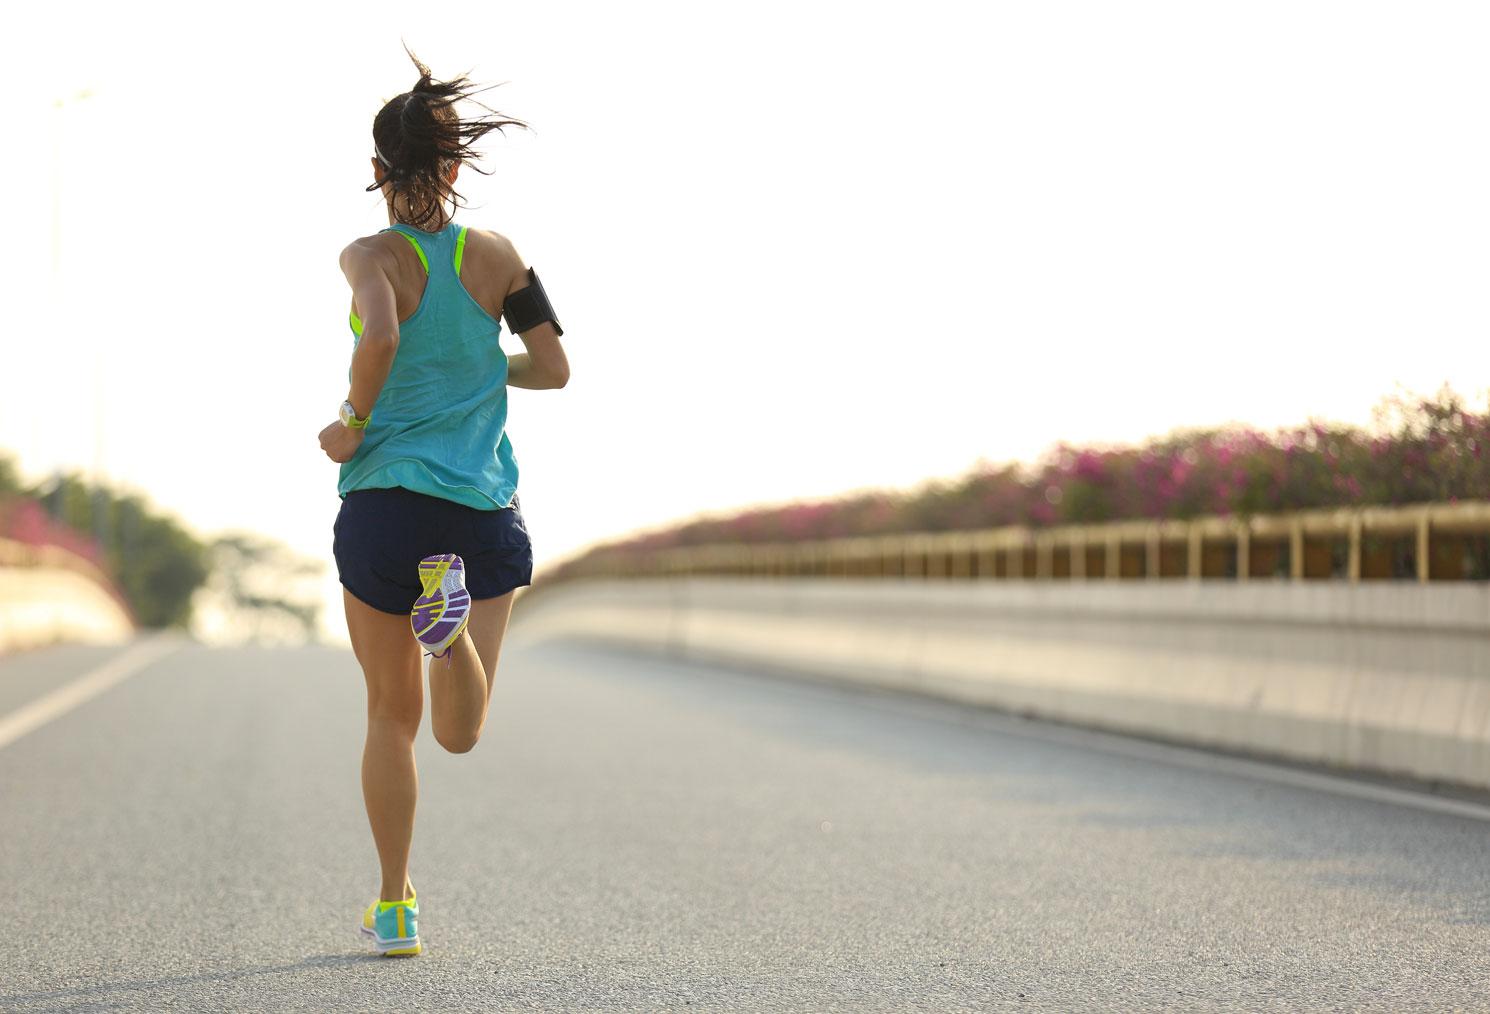 Scarpe Running Neutre: le Migliori 10 Scarpe da Corsa Neutre